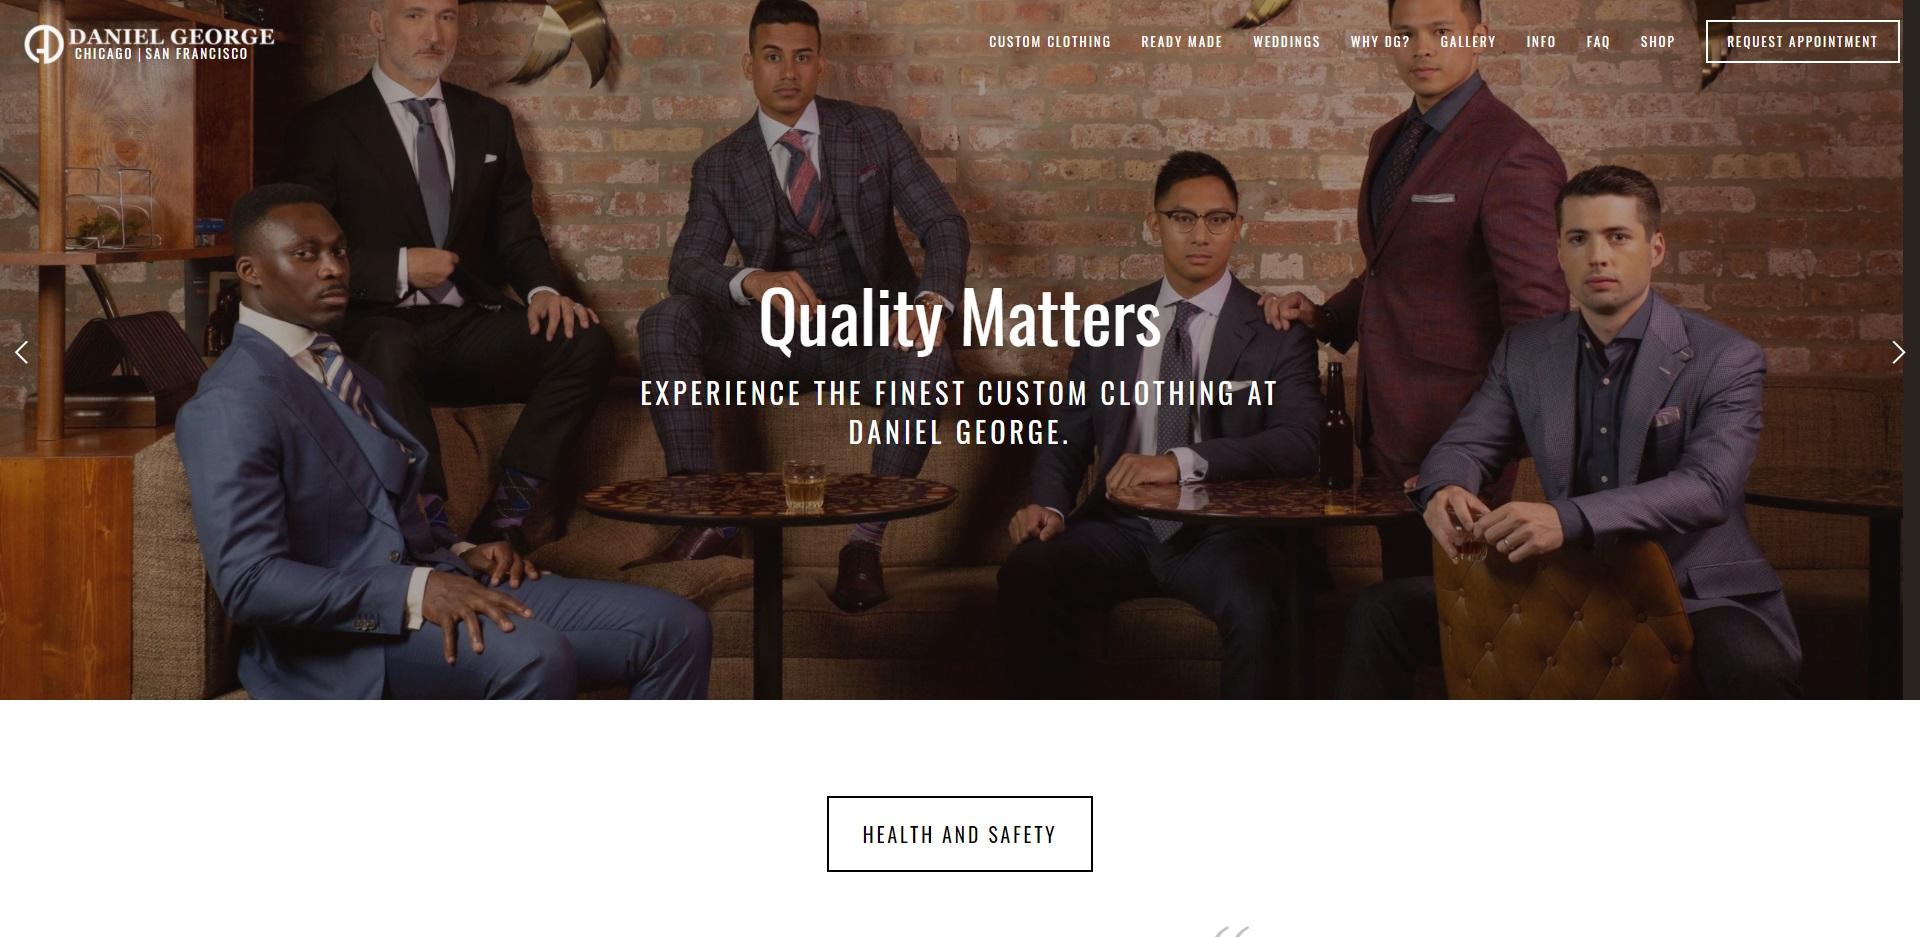 Best Suit Shops in Chicago